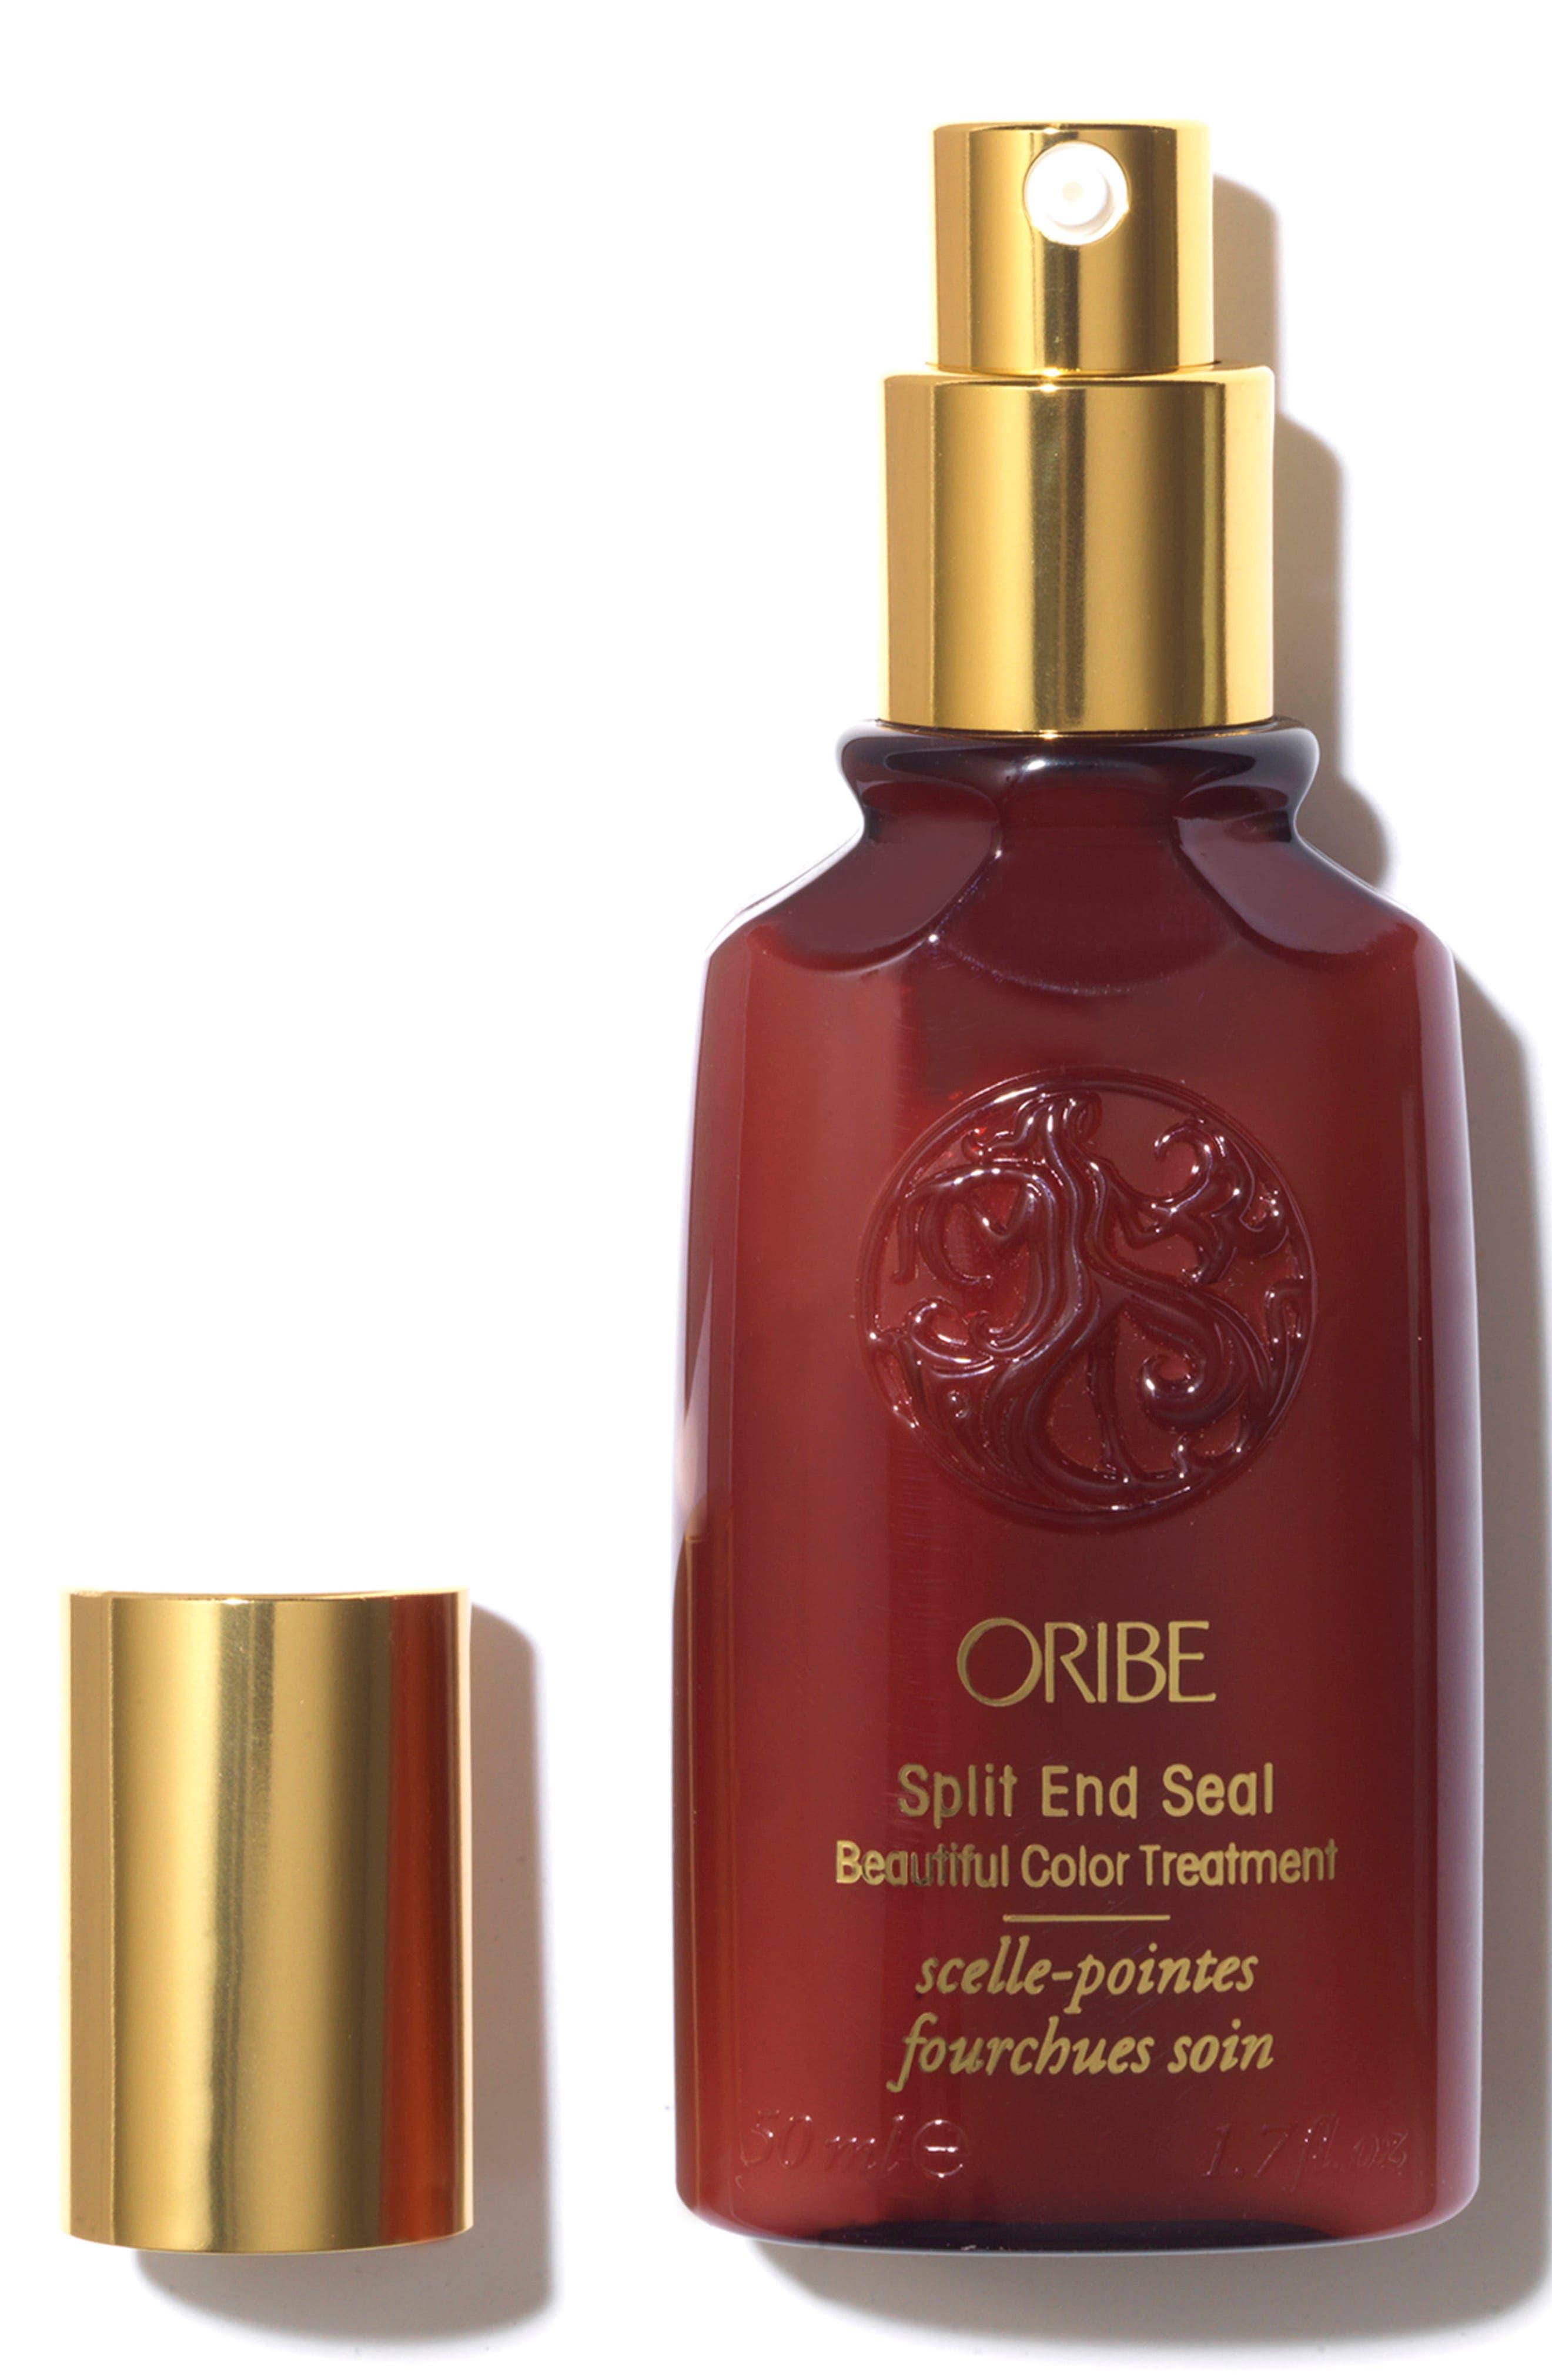 ORIBE, SPACE.NK.apothecary Oribe Split End Seal, Alternate thumbnail 2, color, NO COLOR